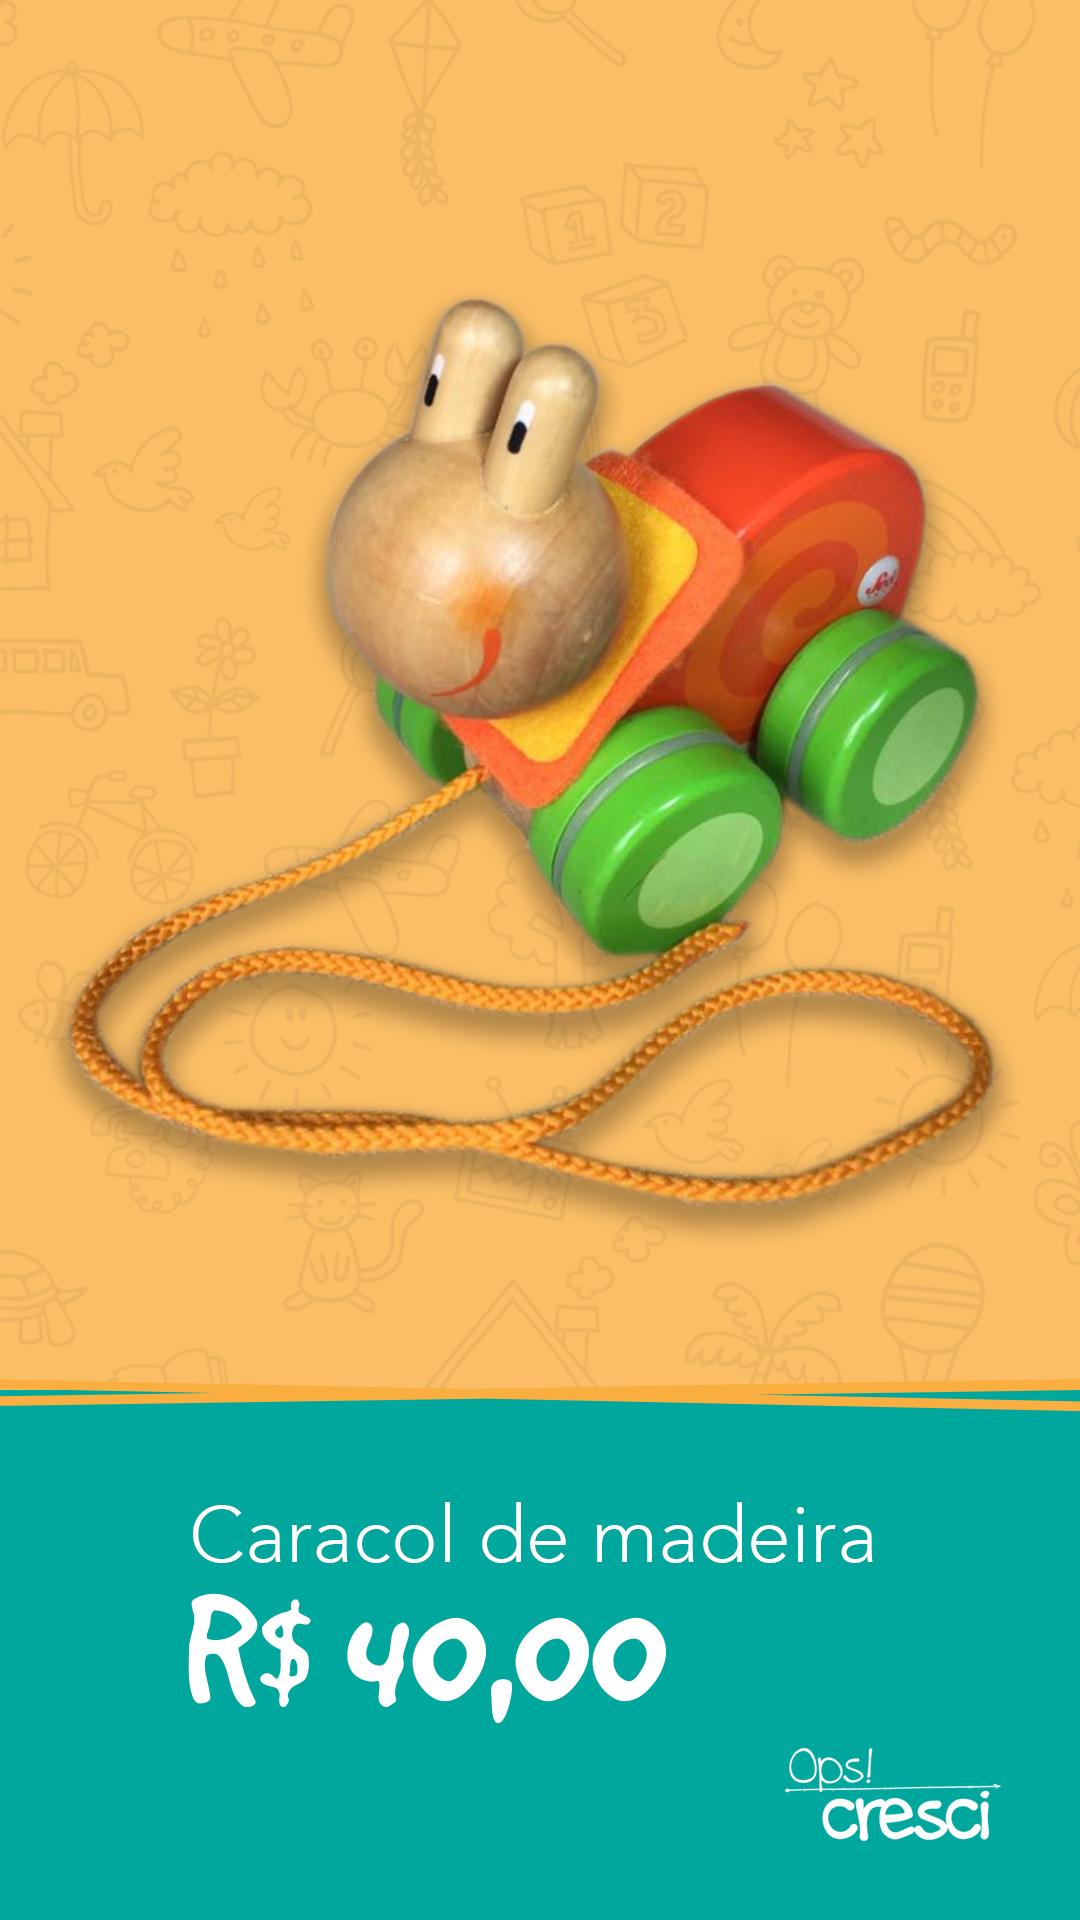 Stories - Brinquedos - 13